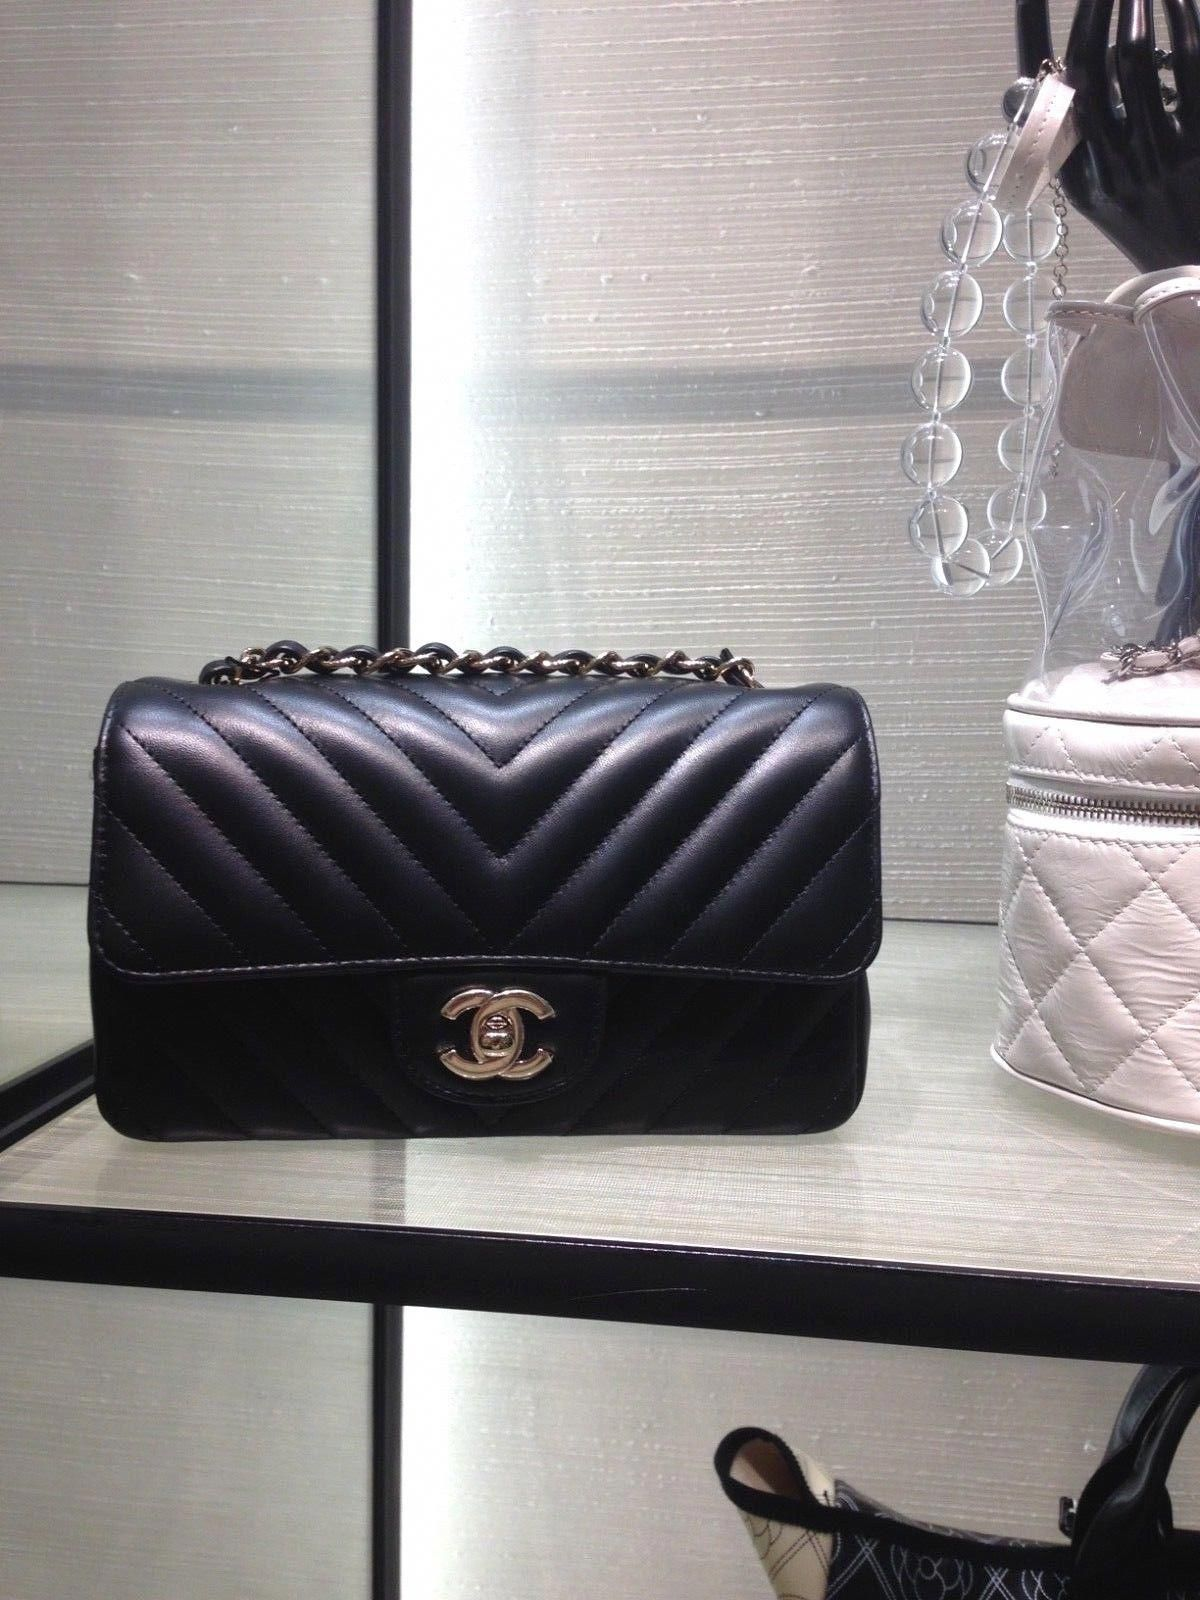 a860a69fd434 NEW CHANEL Current 18S Black Lambskin Chevron Mini Rectangular Flap Bag |  eBay #Chanelhandbags